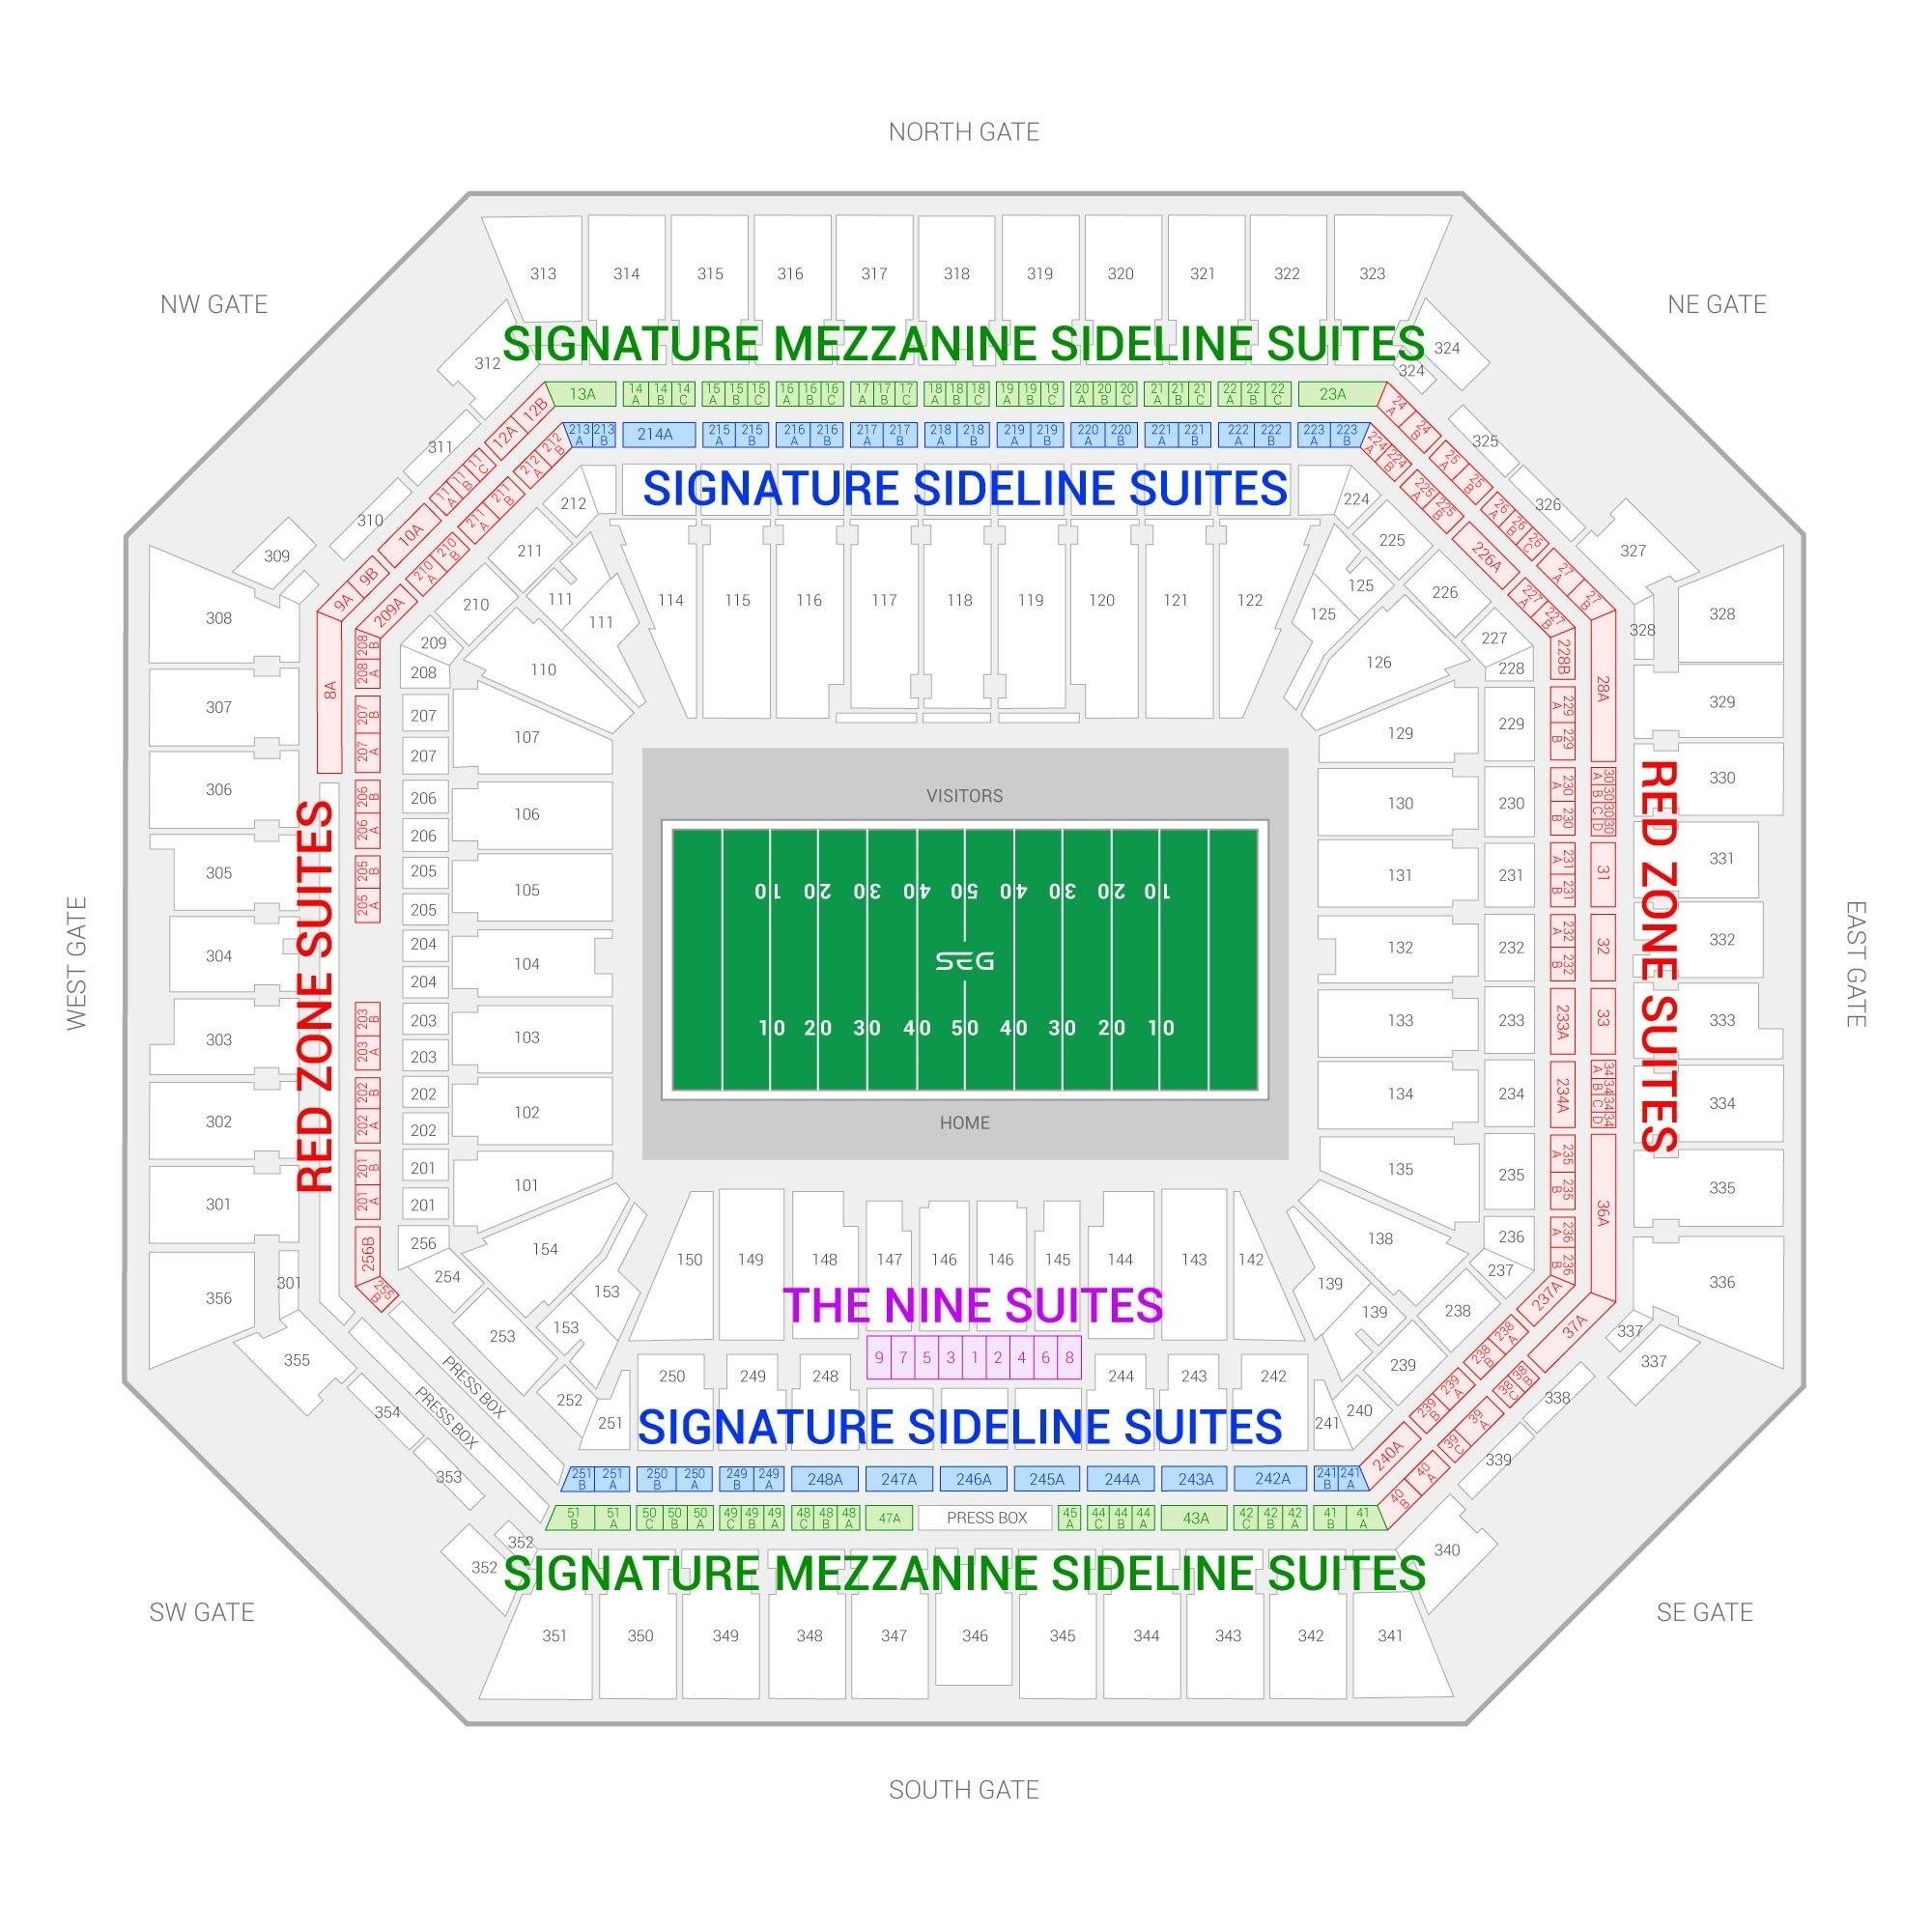 Super Bowl Liv Suite Rentals | Hard Rock Stadium throughout Super Bowl Seat Map